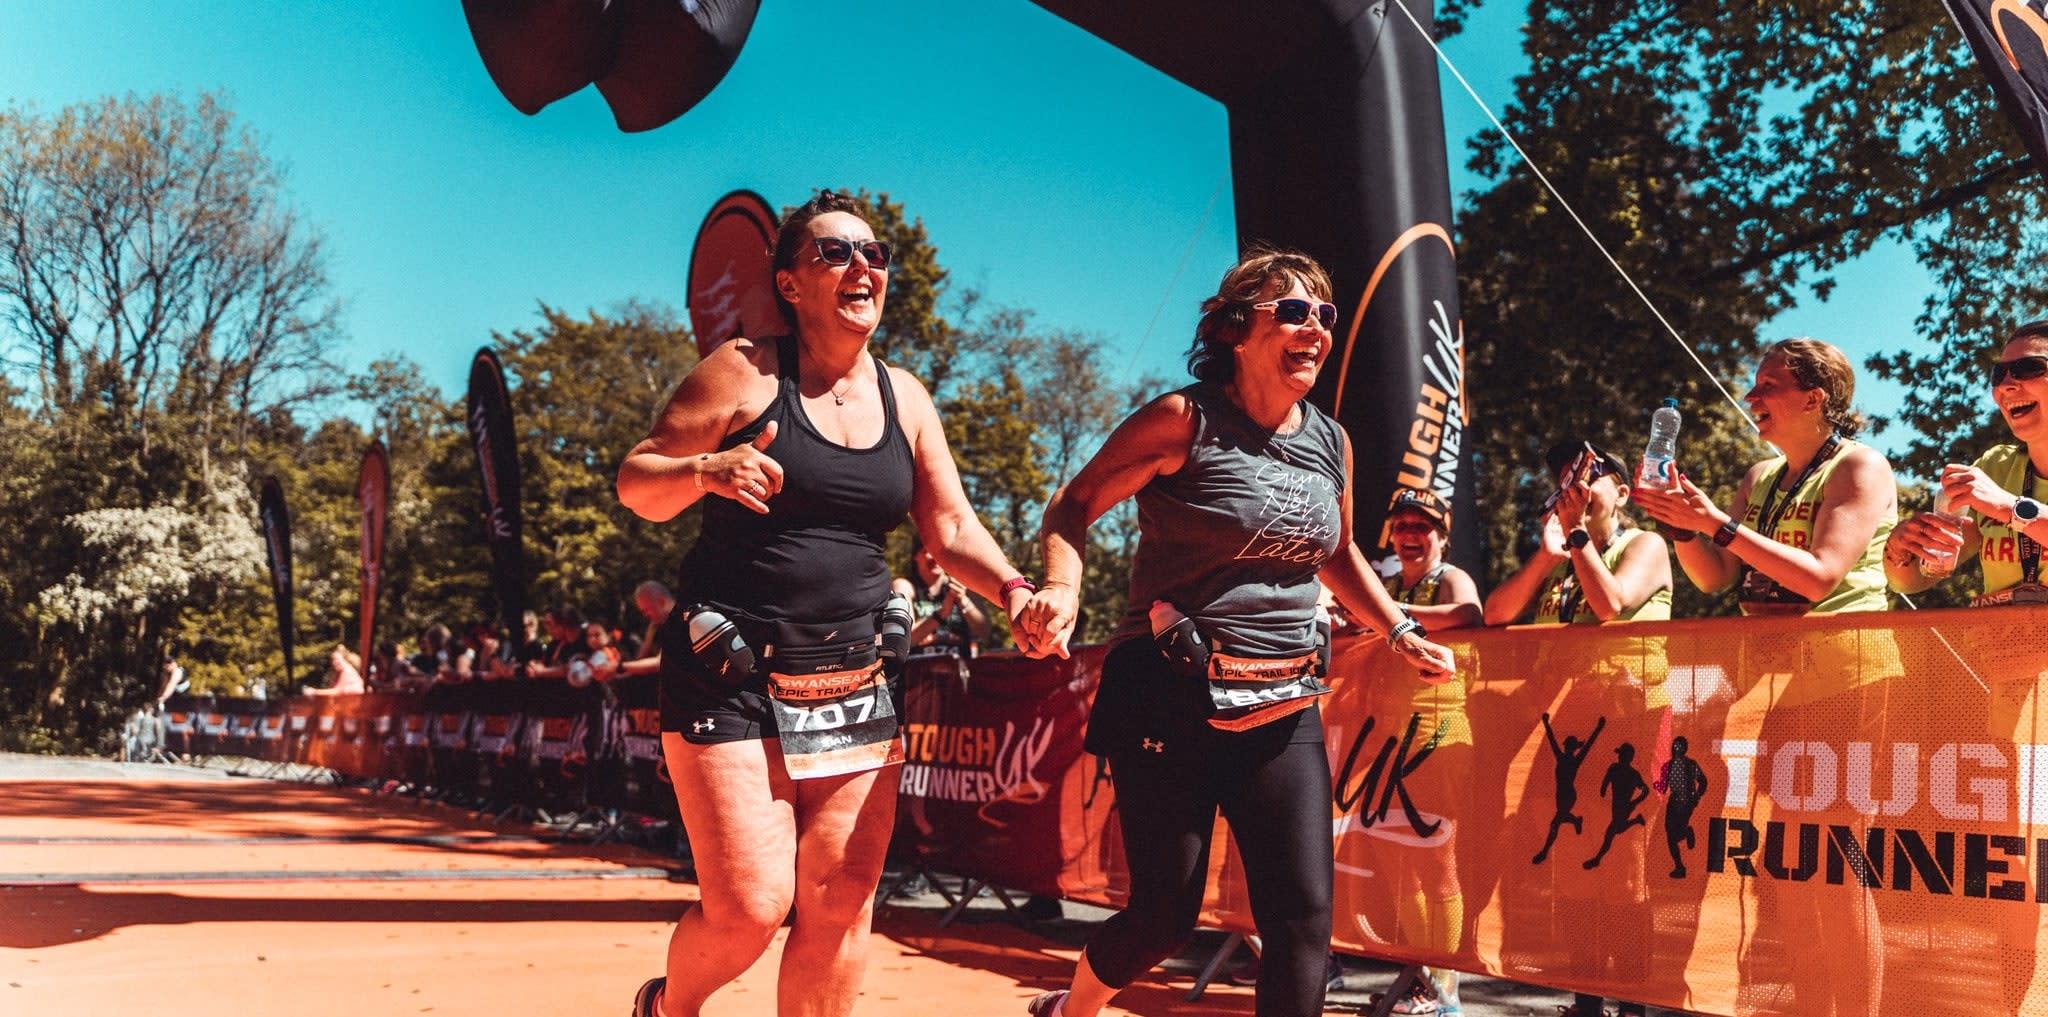 Drumlanrig Half Marathon, 10k & 5k